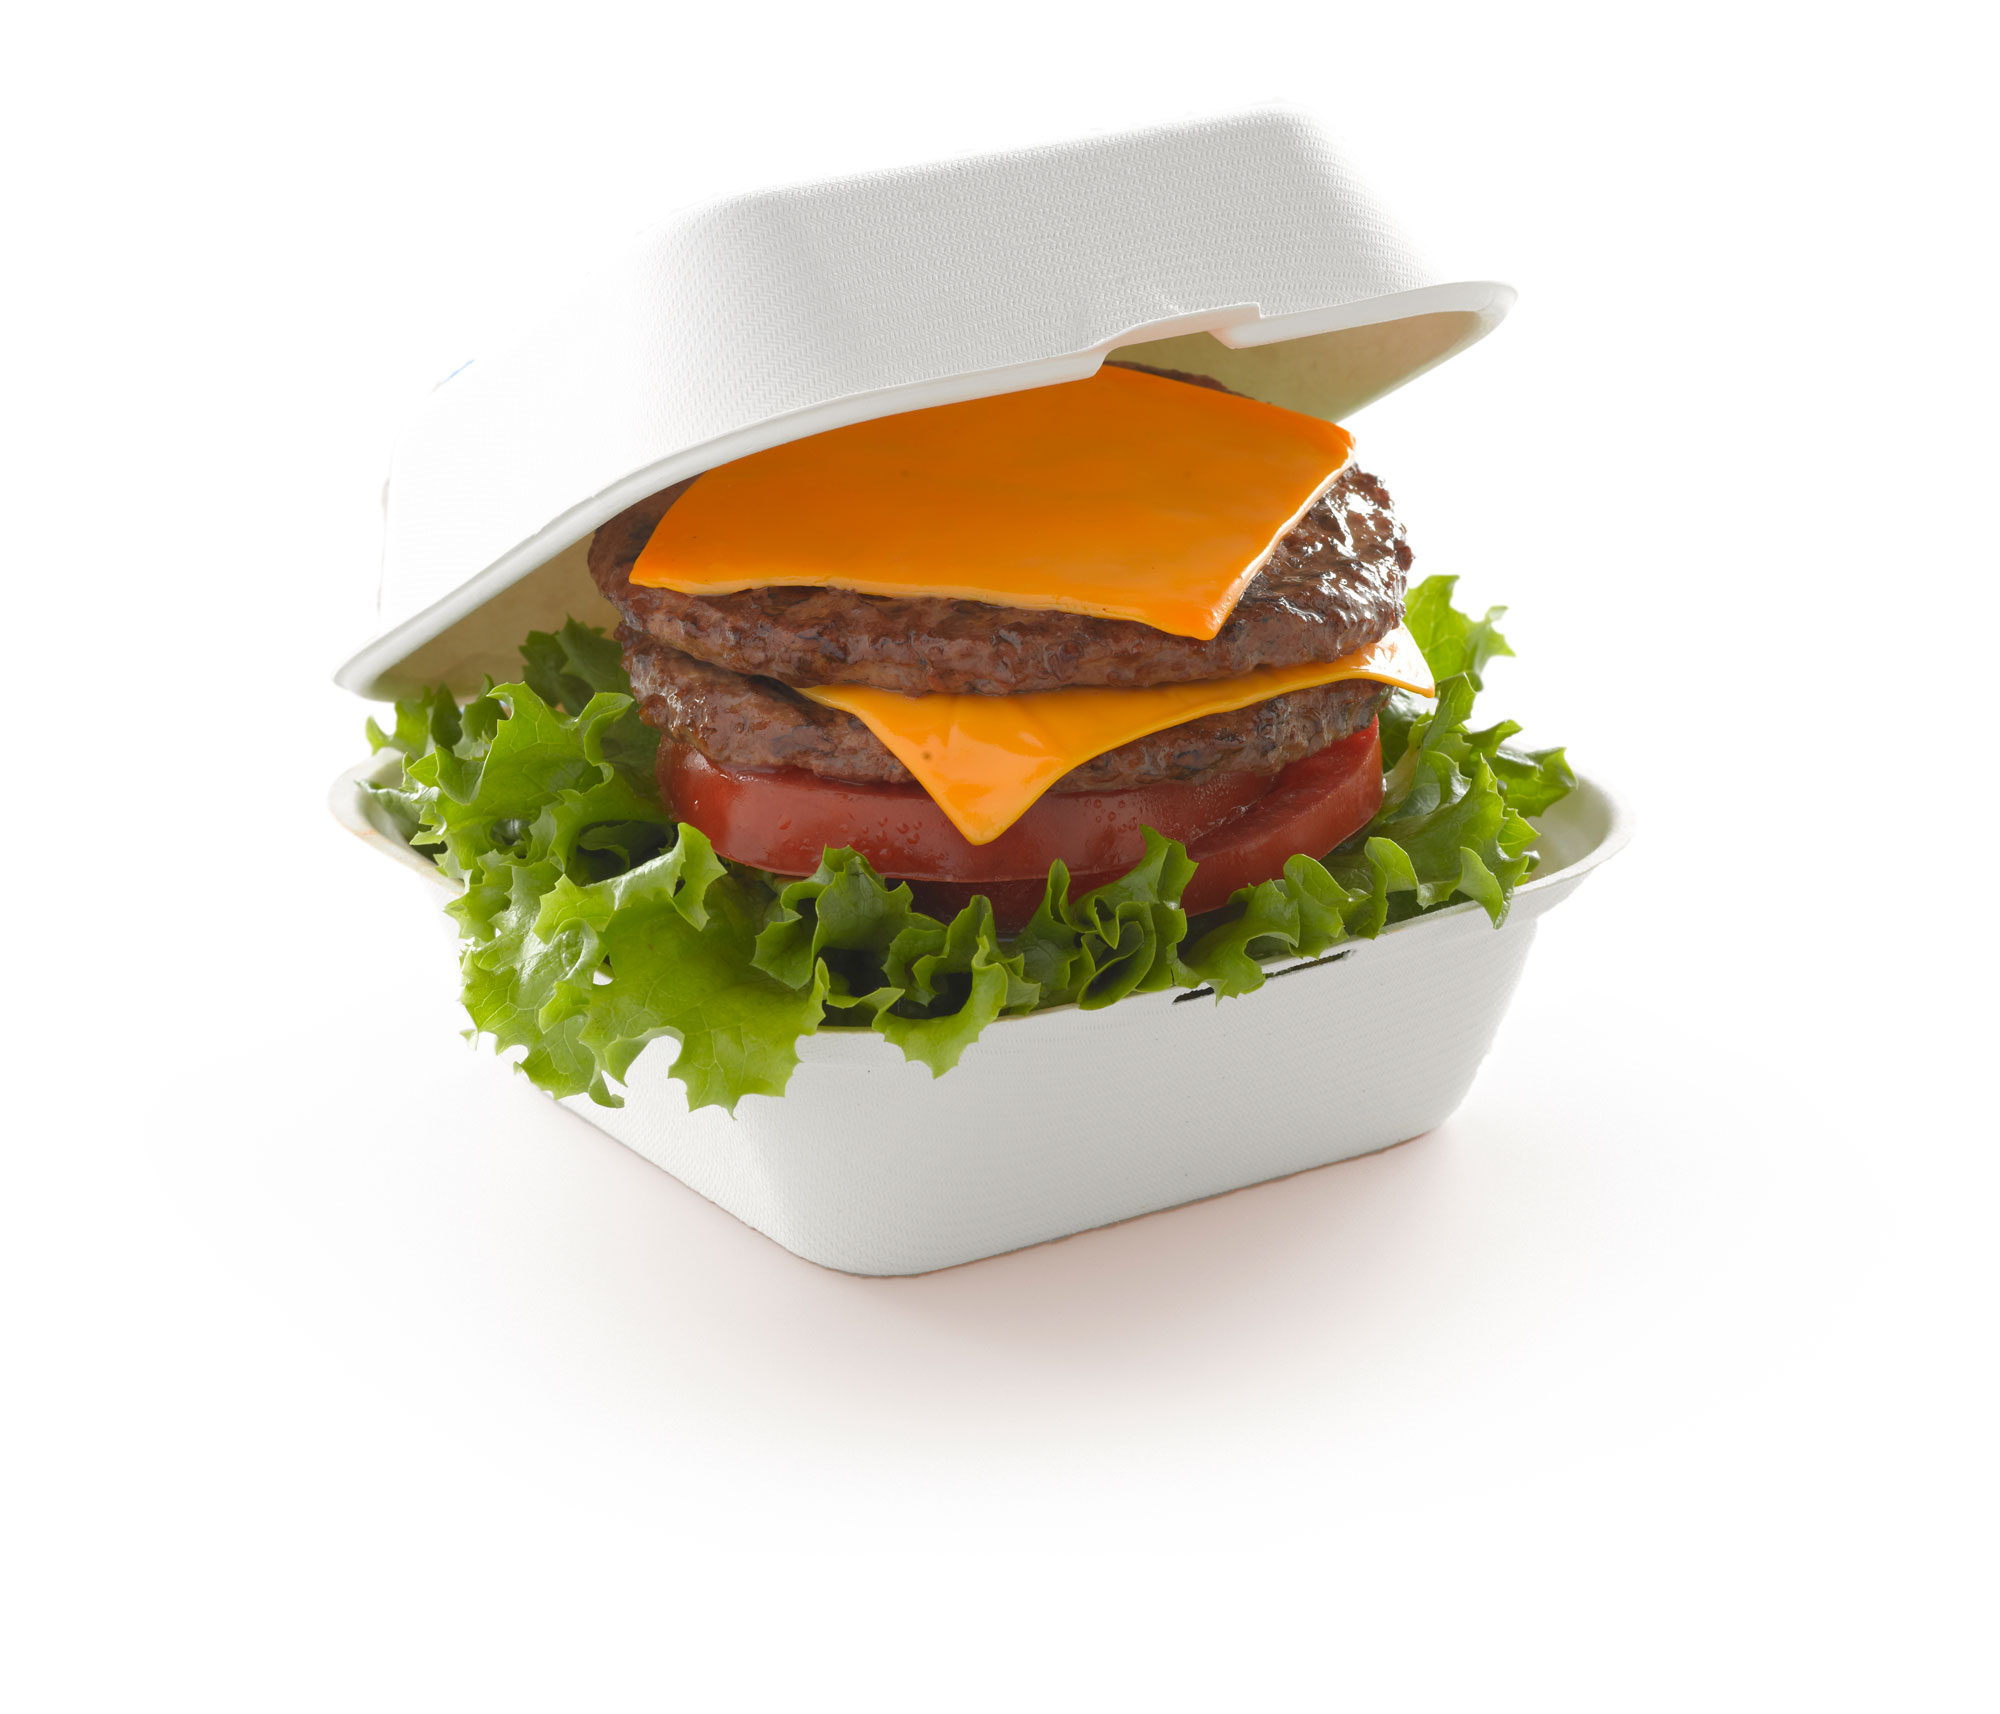 Cheeseburger00001.jpg